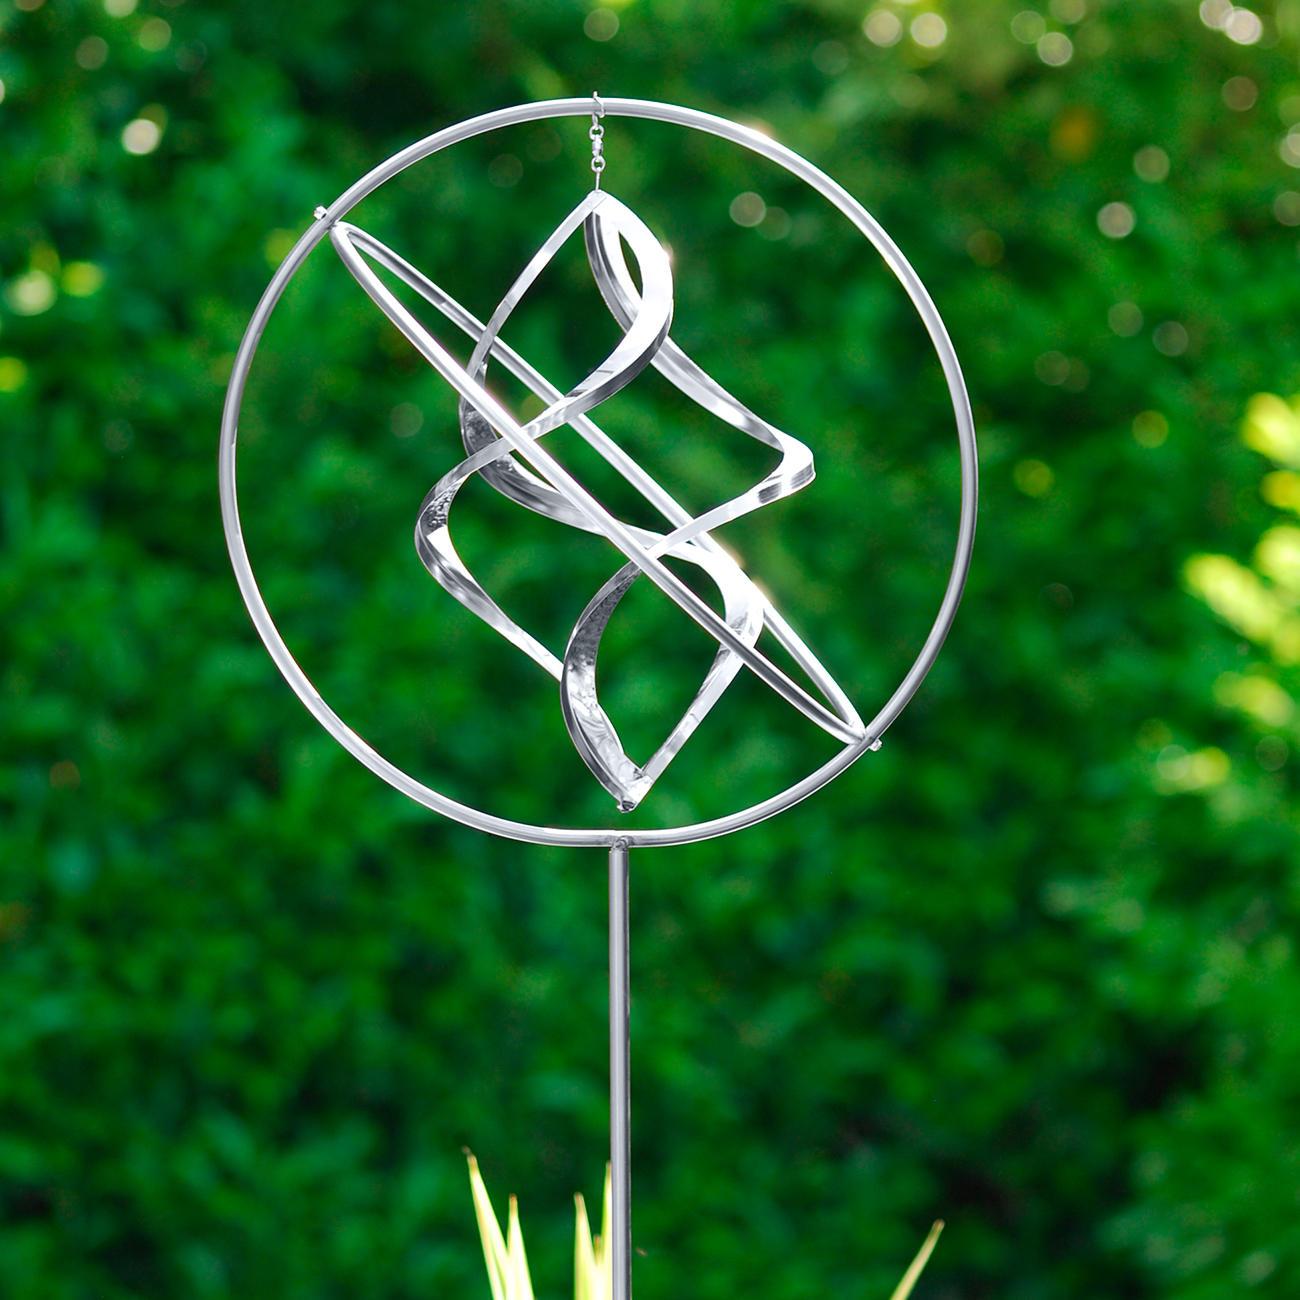 Edelstahl windspiel 3 jahre garantie pro idee for Tuin allen idee